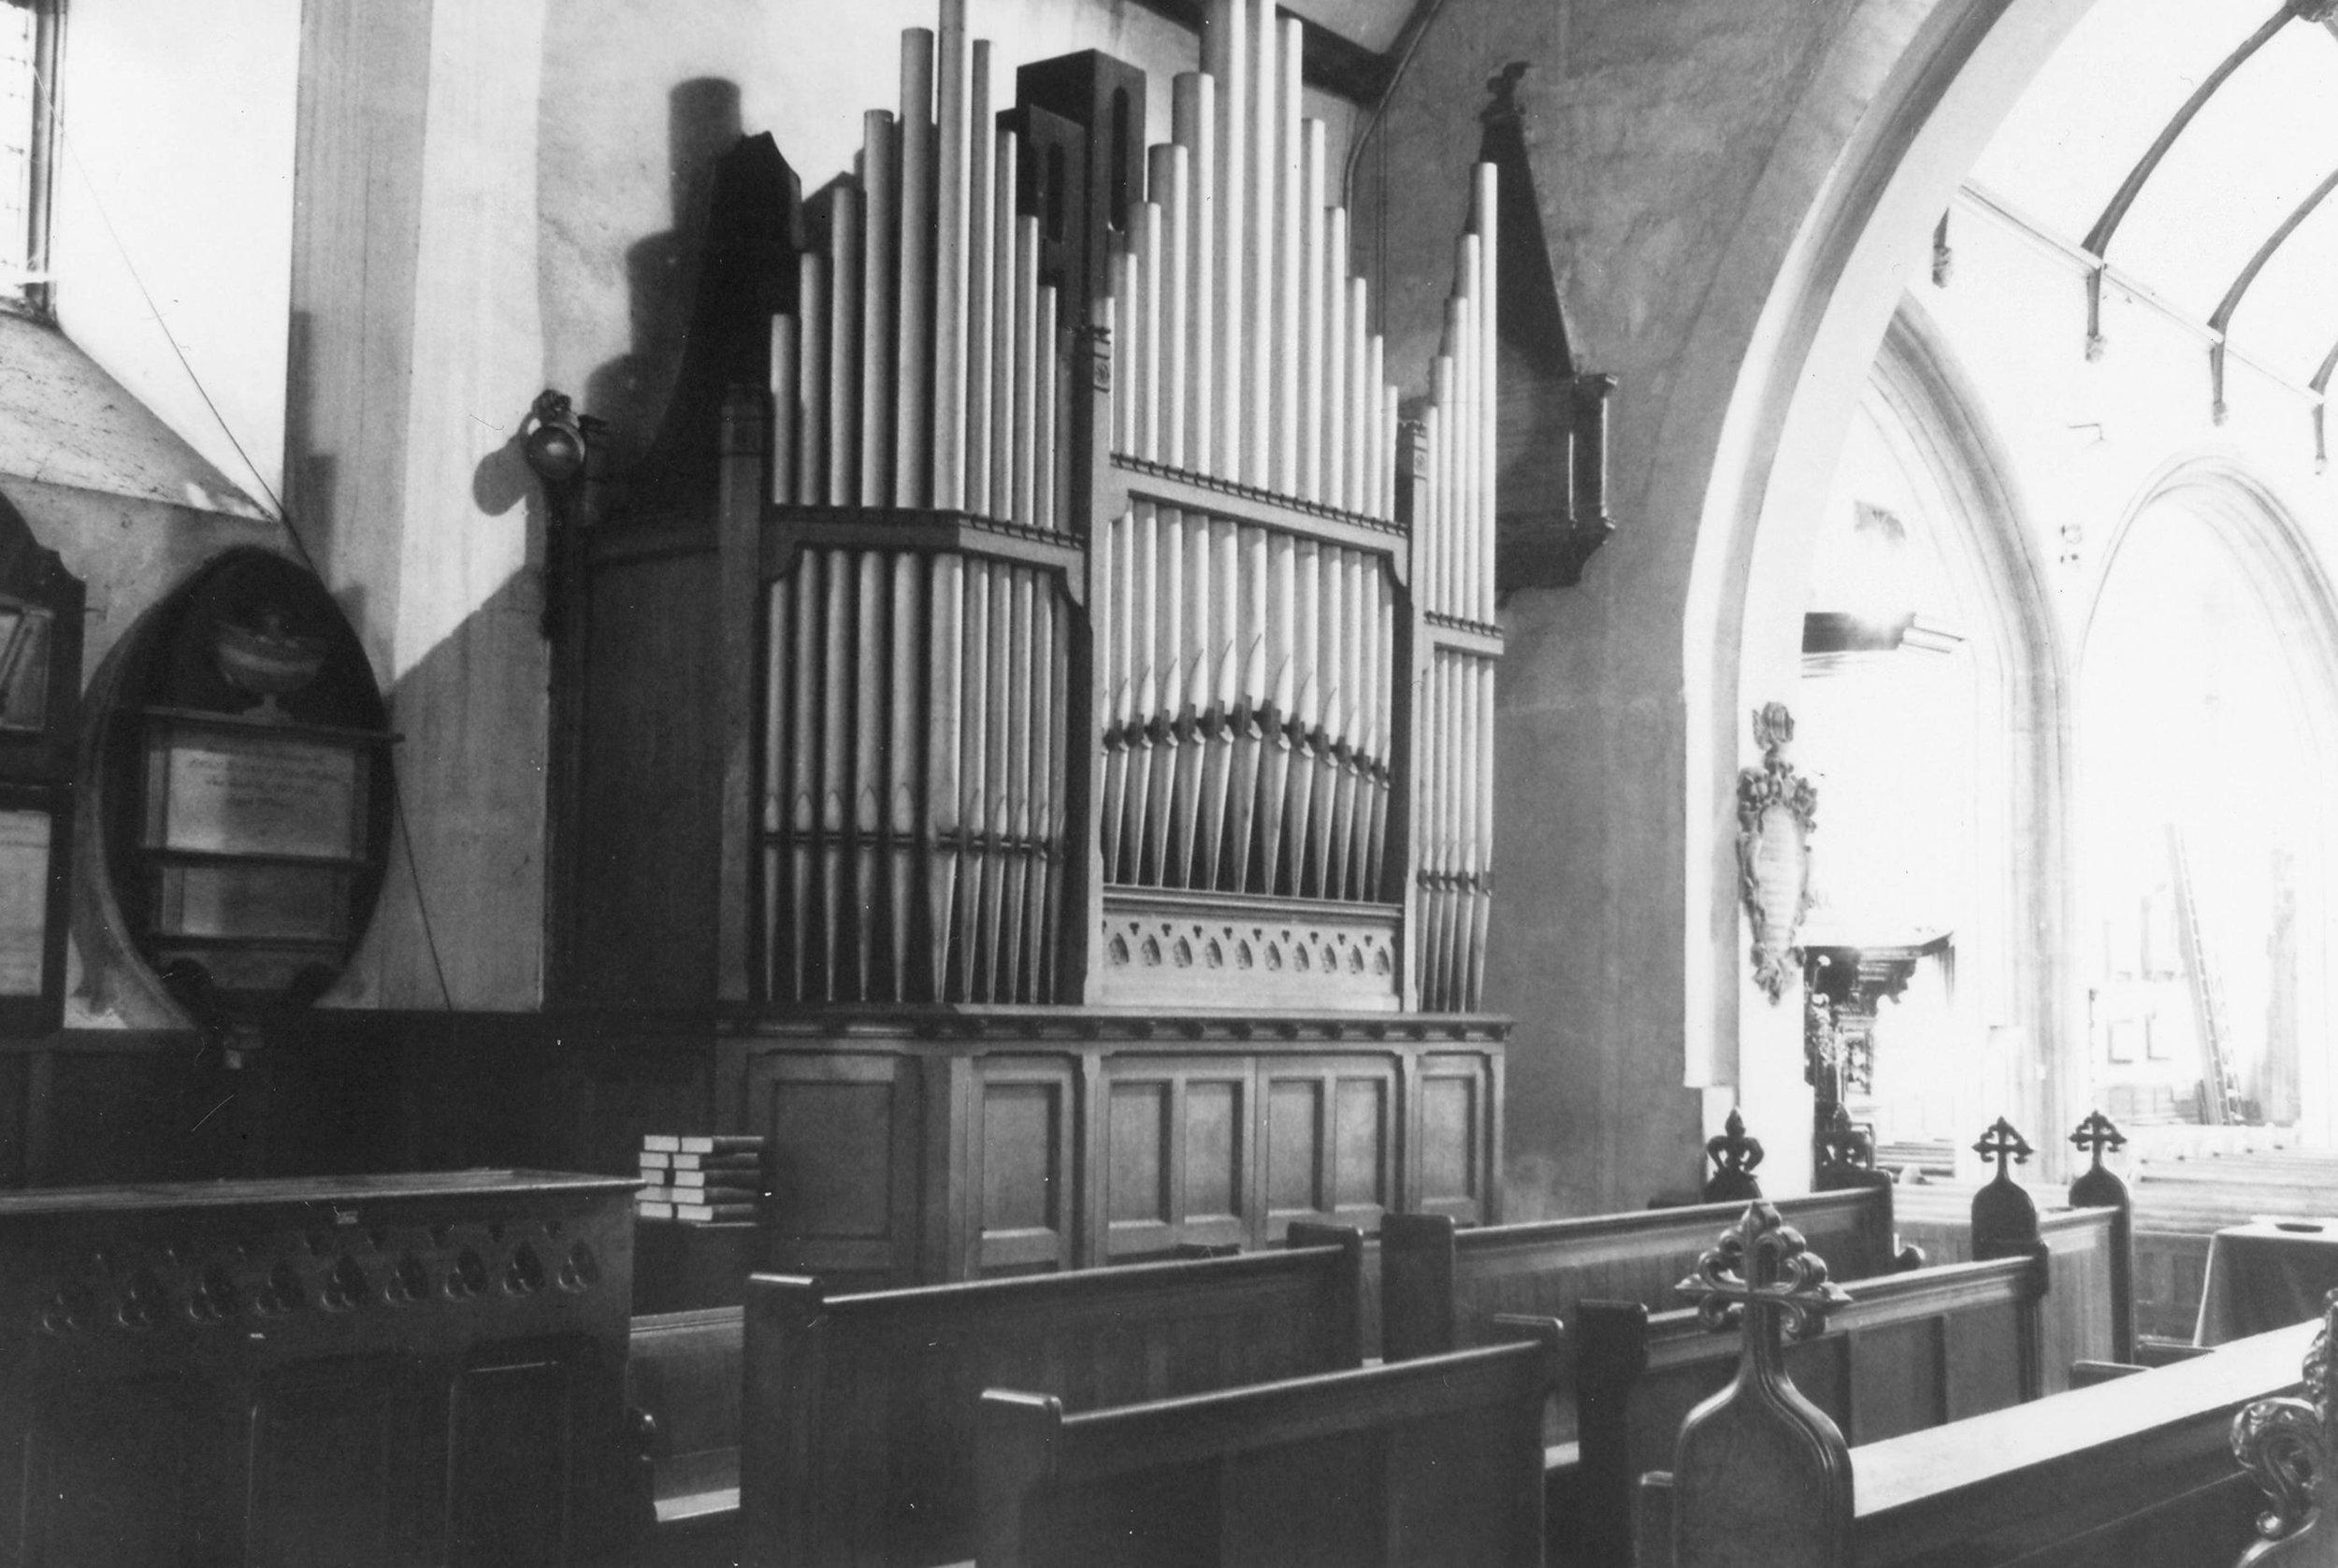 Choir stalls and south side of split organ